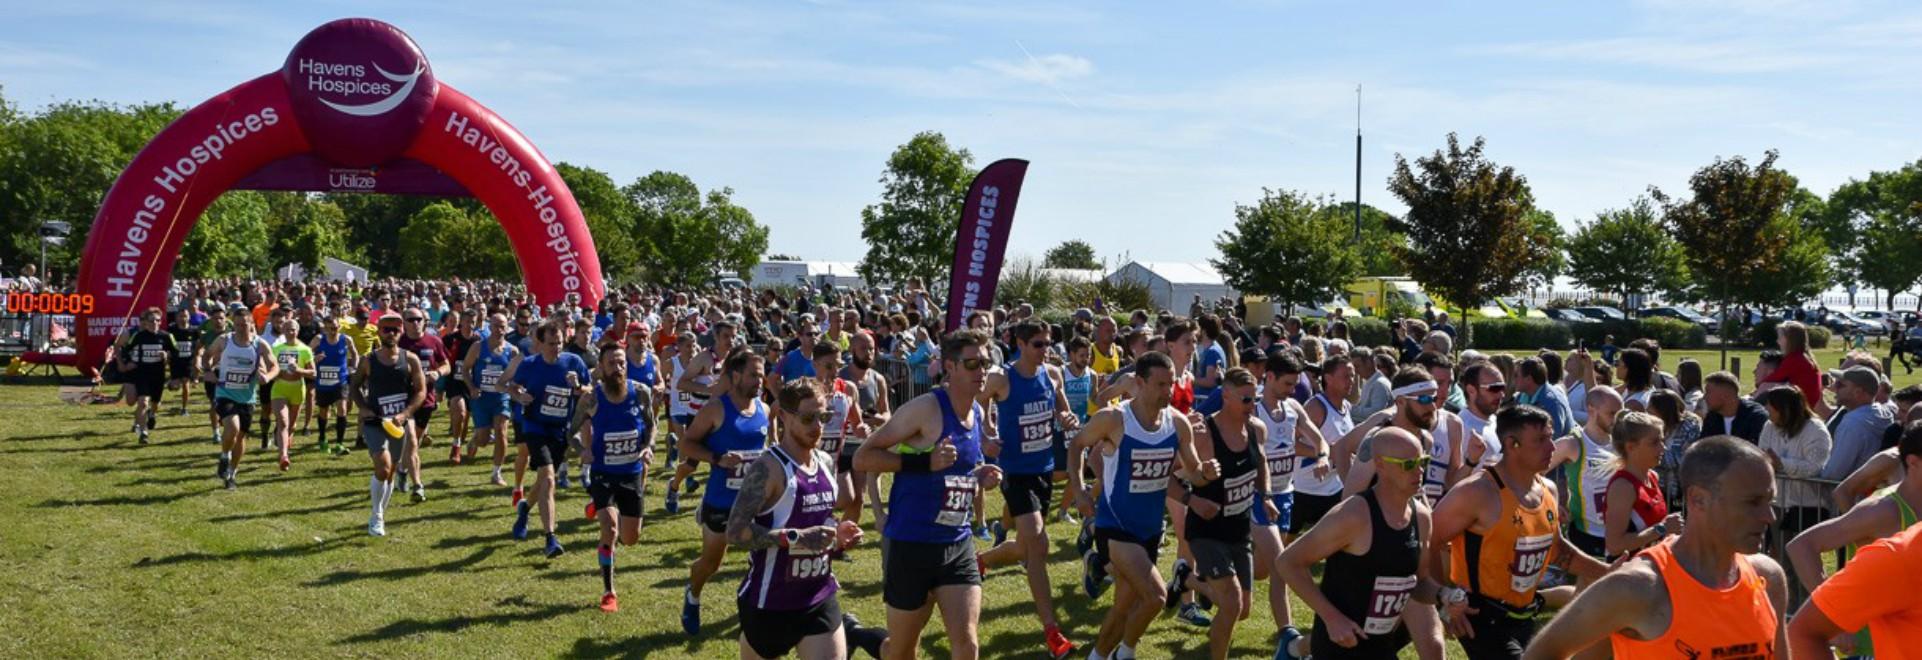 Southend Half Marathon - cover image